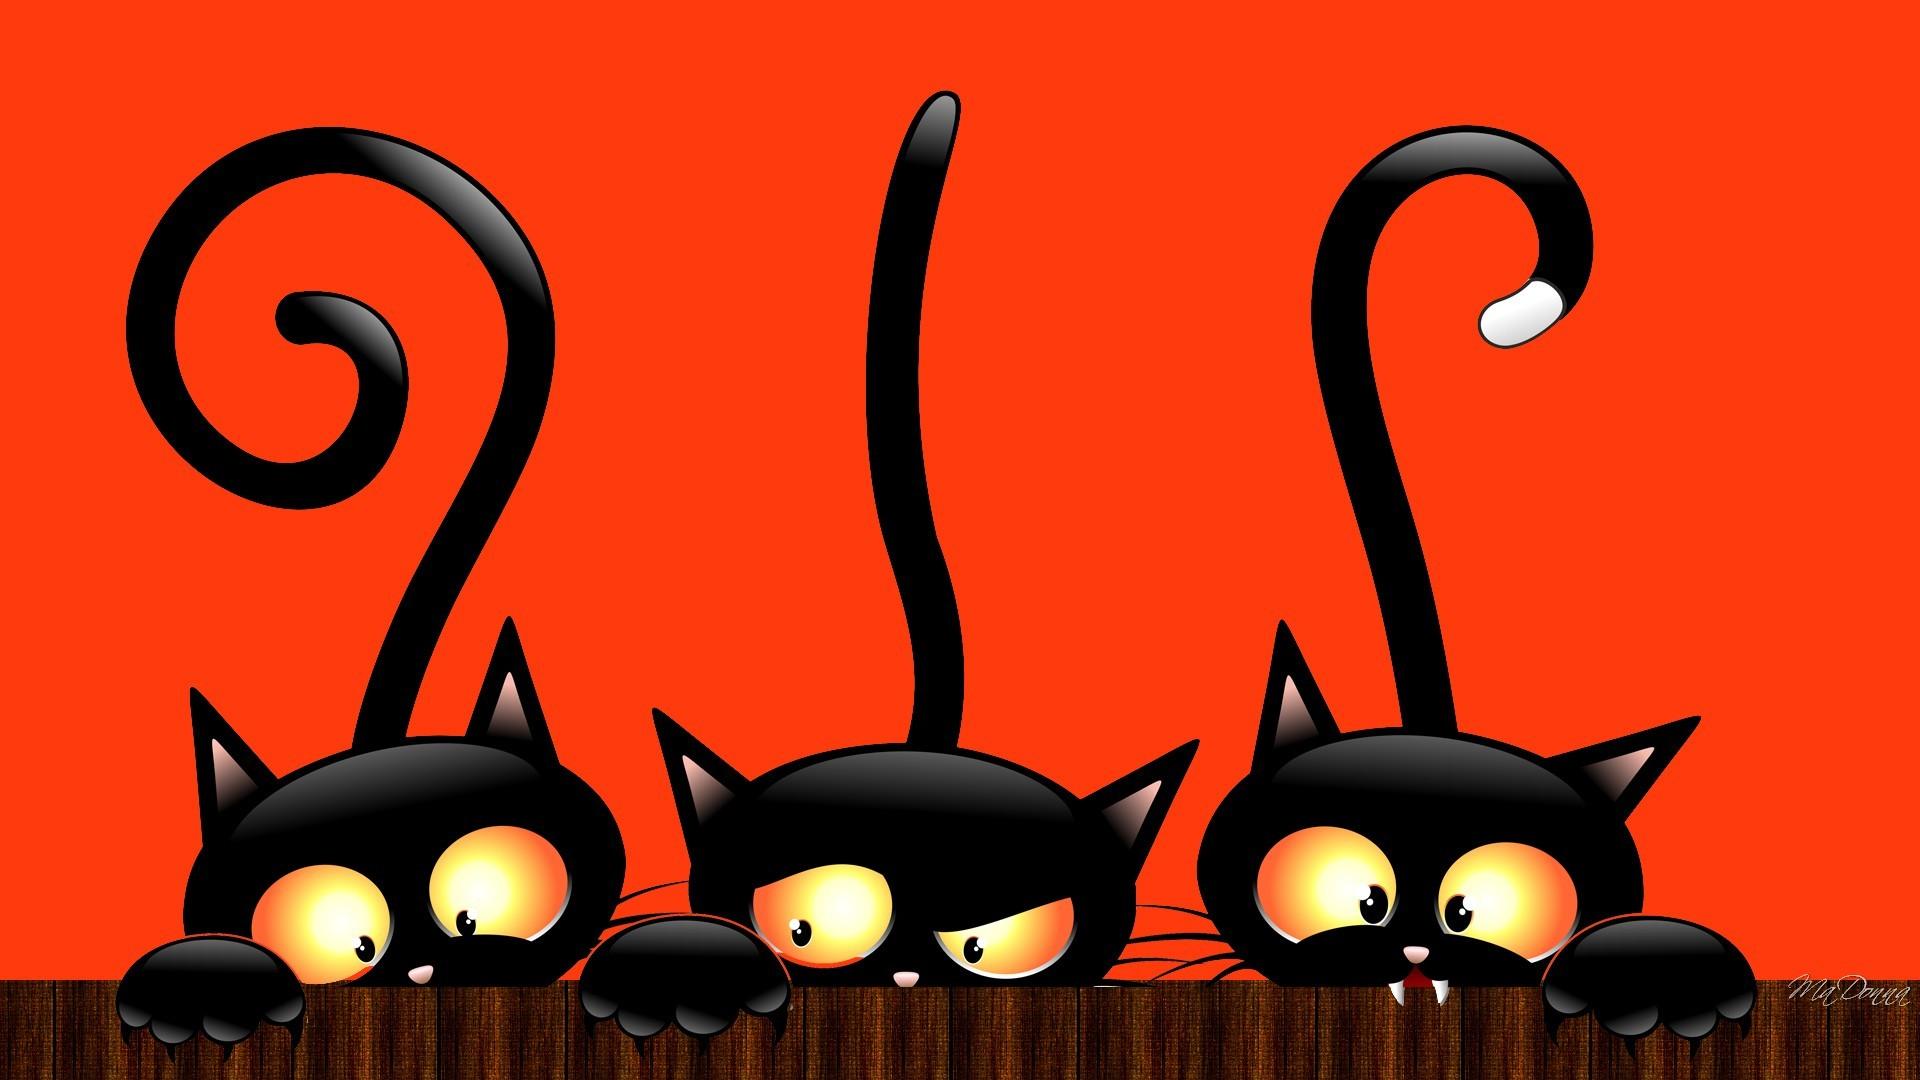 Popular Wallpaper Halloween Iphone Se - 288164-widescreen-halloween-backgrounds-1920x1080-for-iphone-5s  HD_552947.jpg